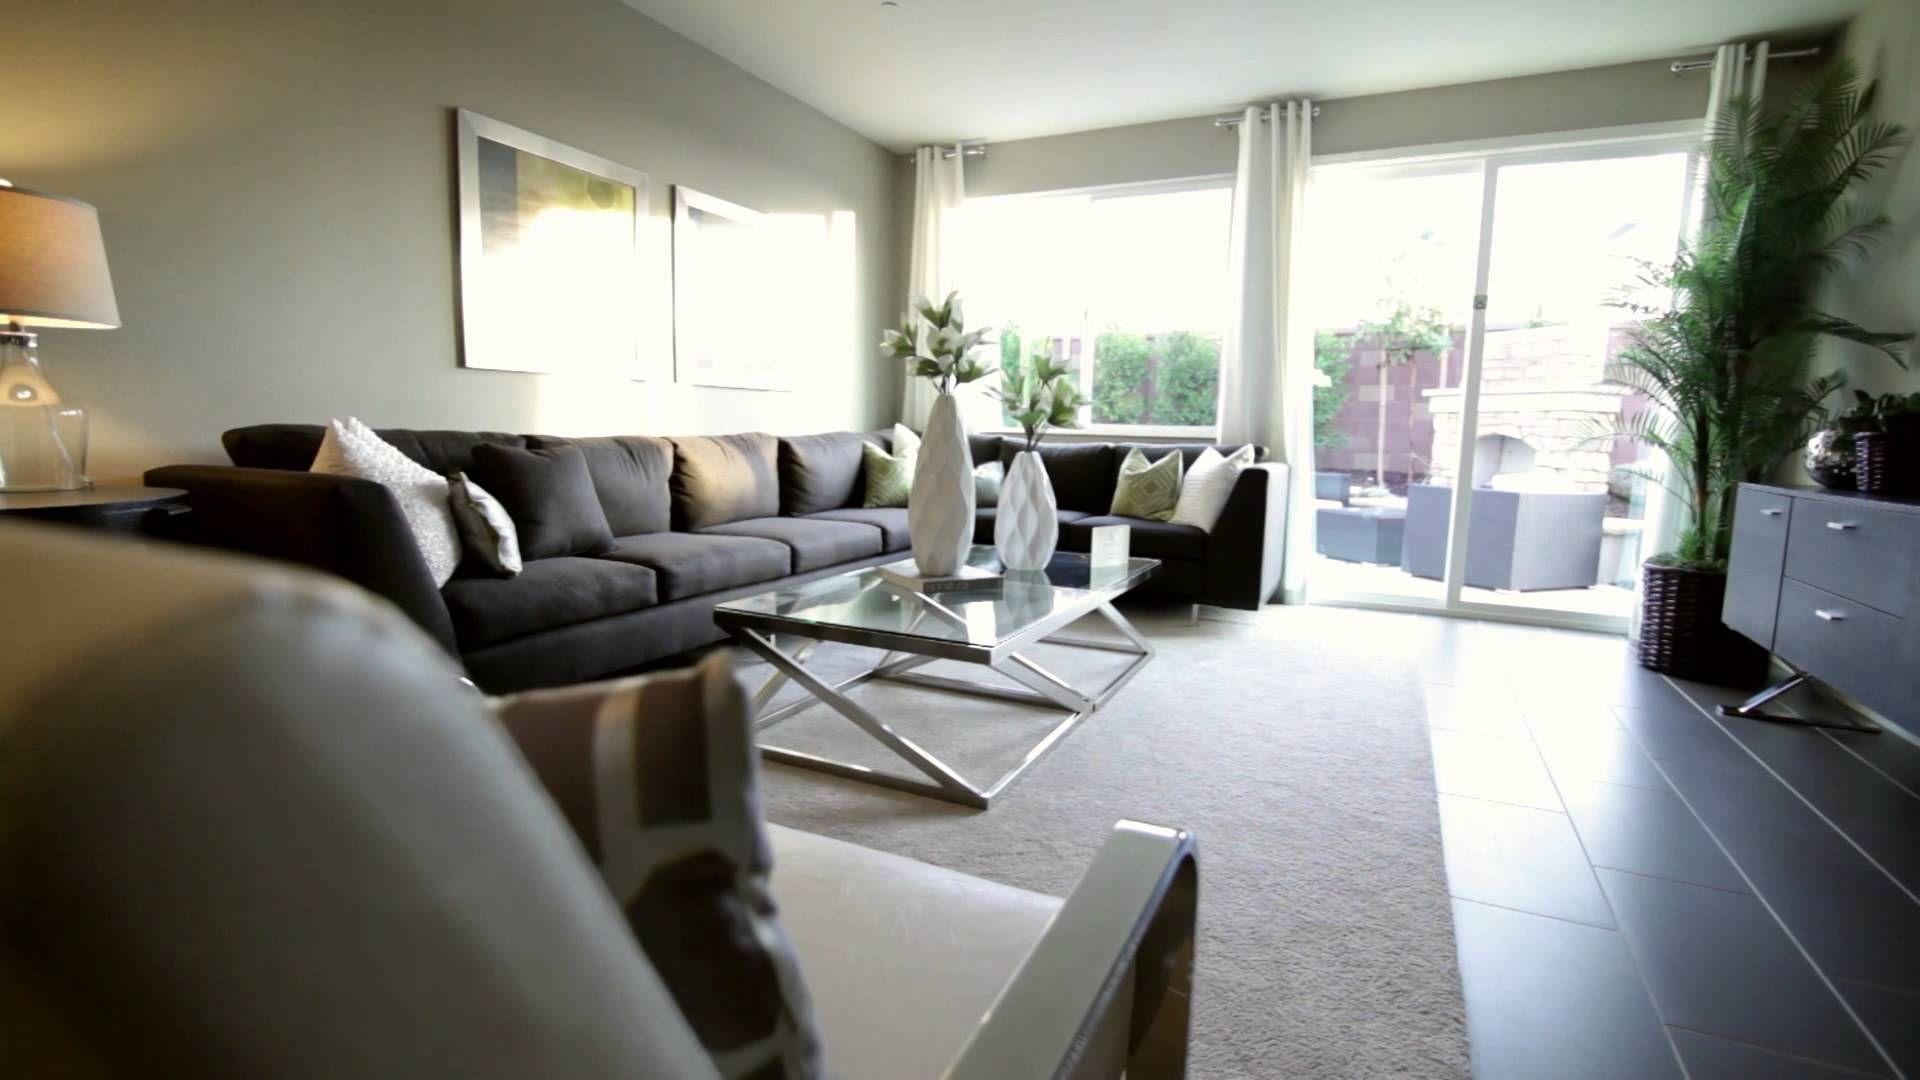 The Boracay Floorplan | New Homes Sacramento By Lennar | Be Inspired: Green  | Pinterest | Room Ideas And Room